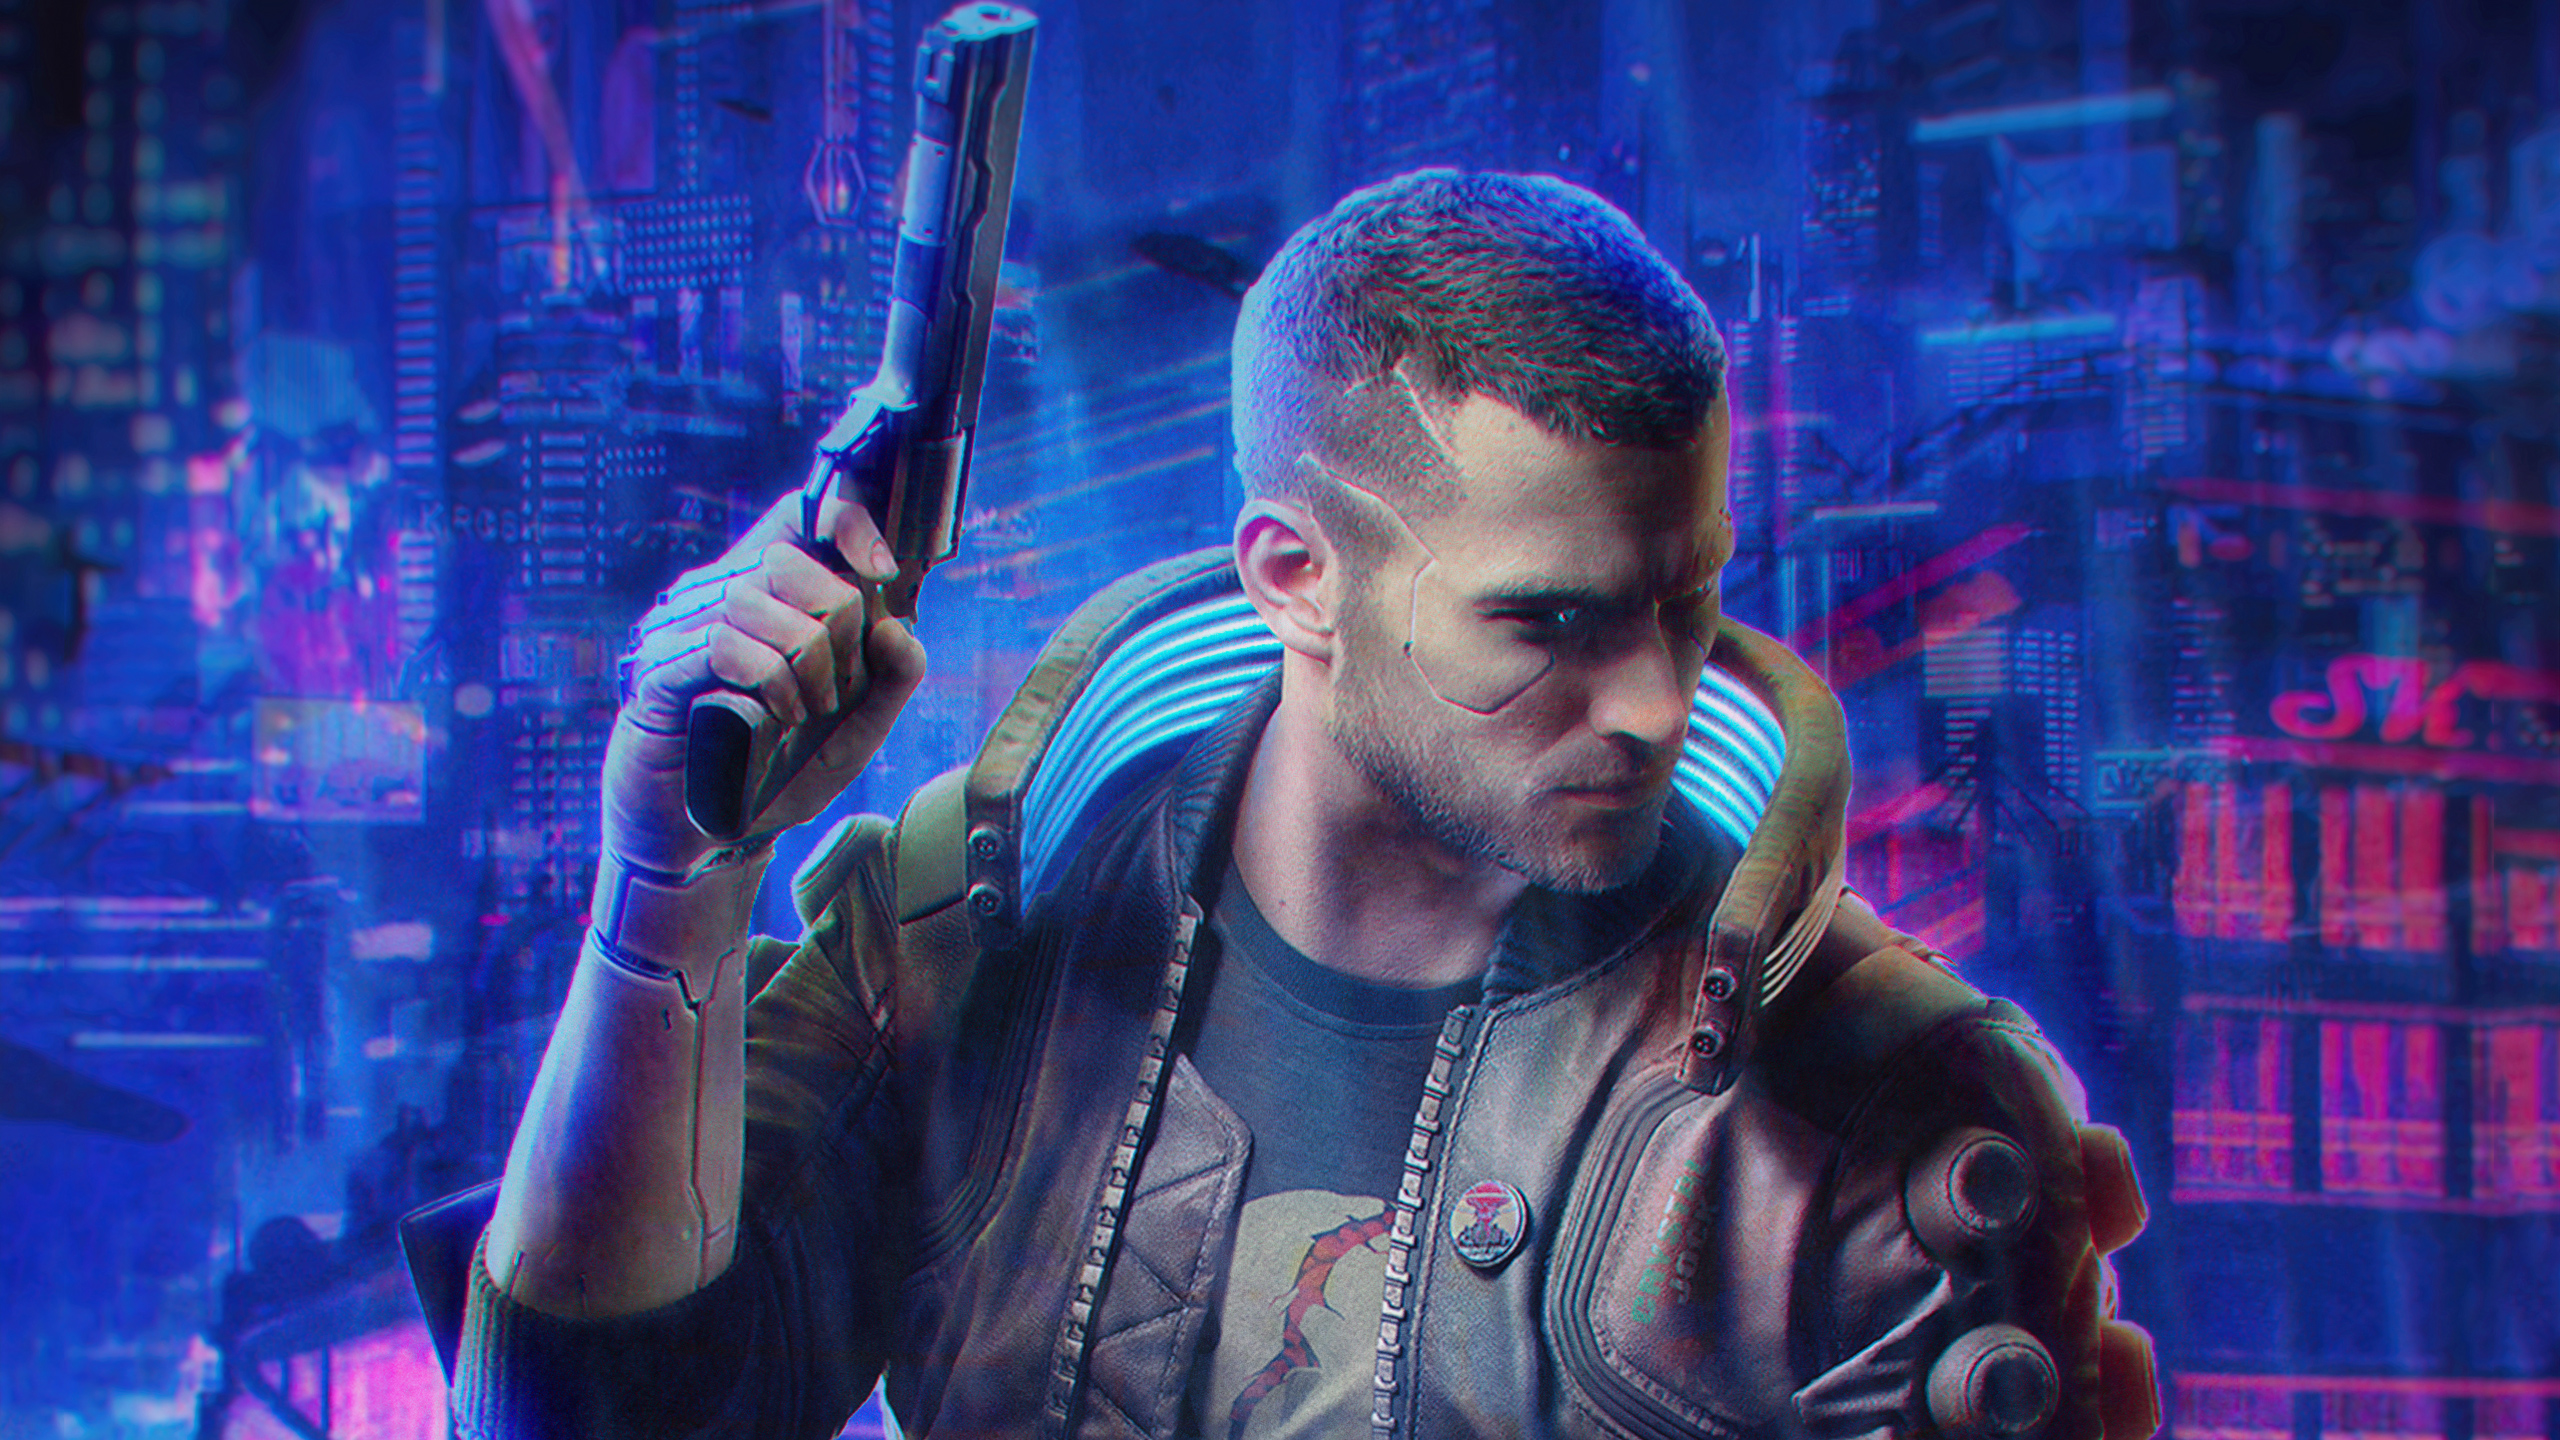 Cyberpunk 2077 Fan Poster, HD Games, 4k Wallpapers, Images ...